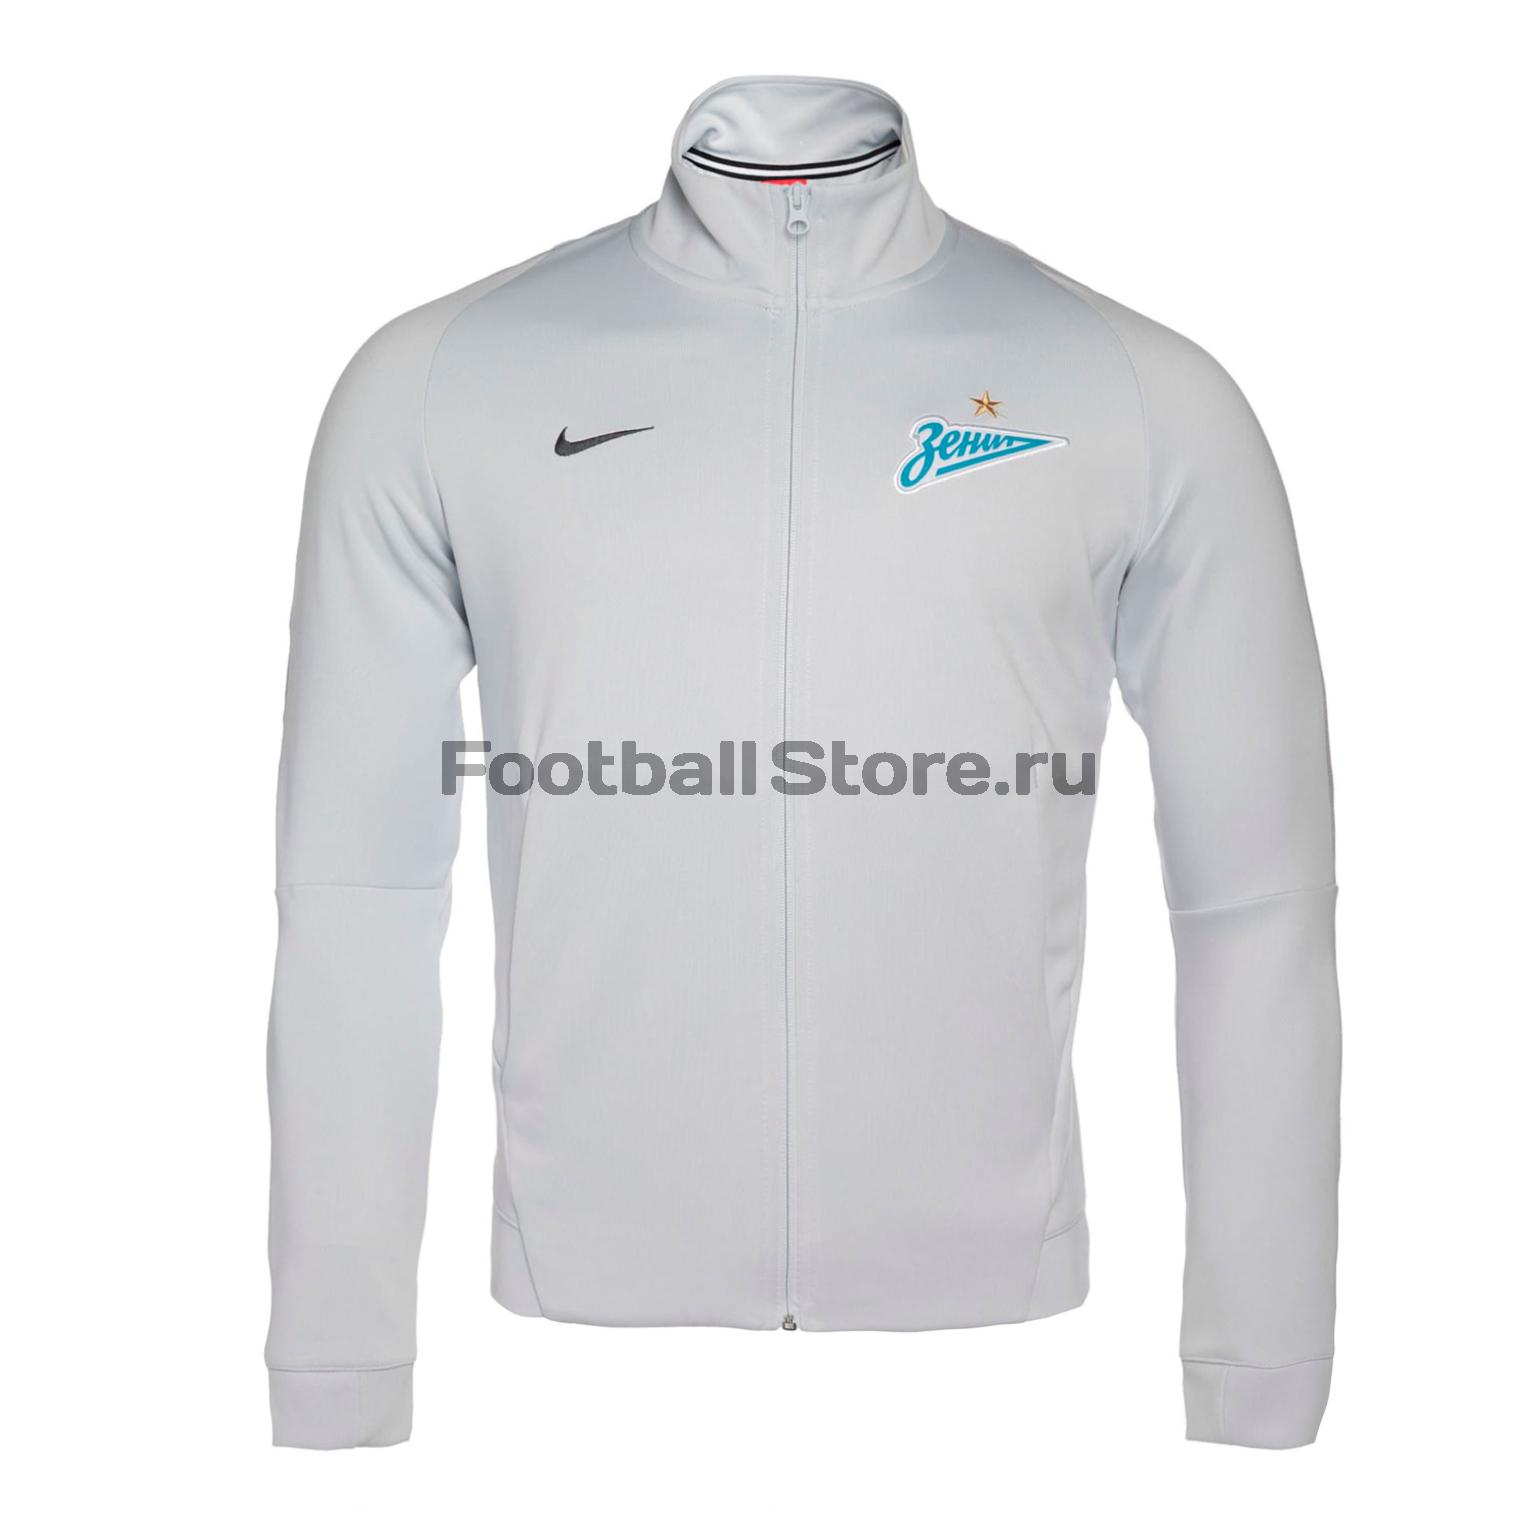 Олимпийка Nike Zenit 868908-043 сумка nike allegiance zenit shield compac ba5053 441